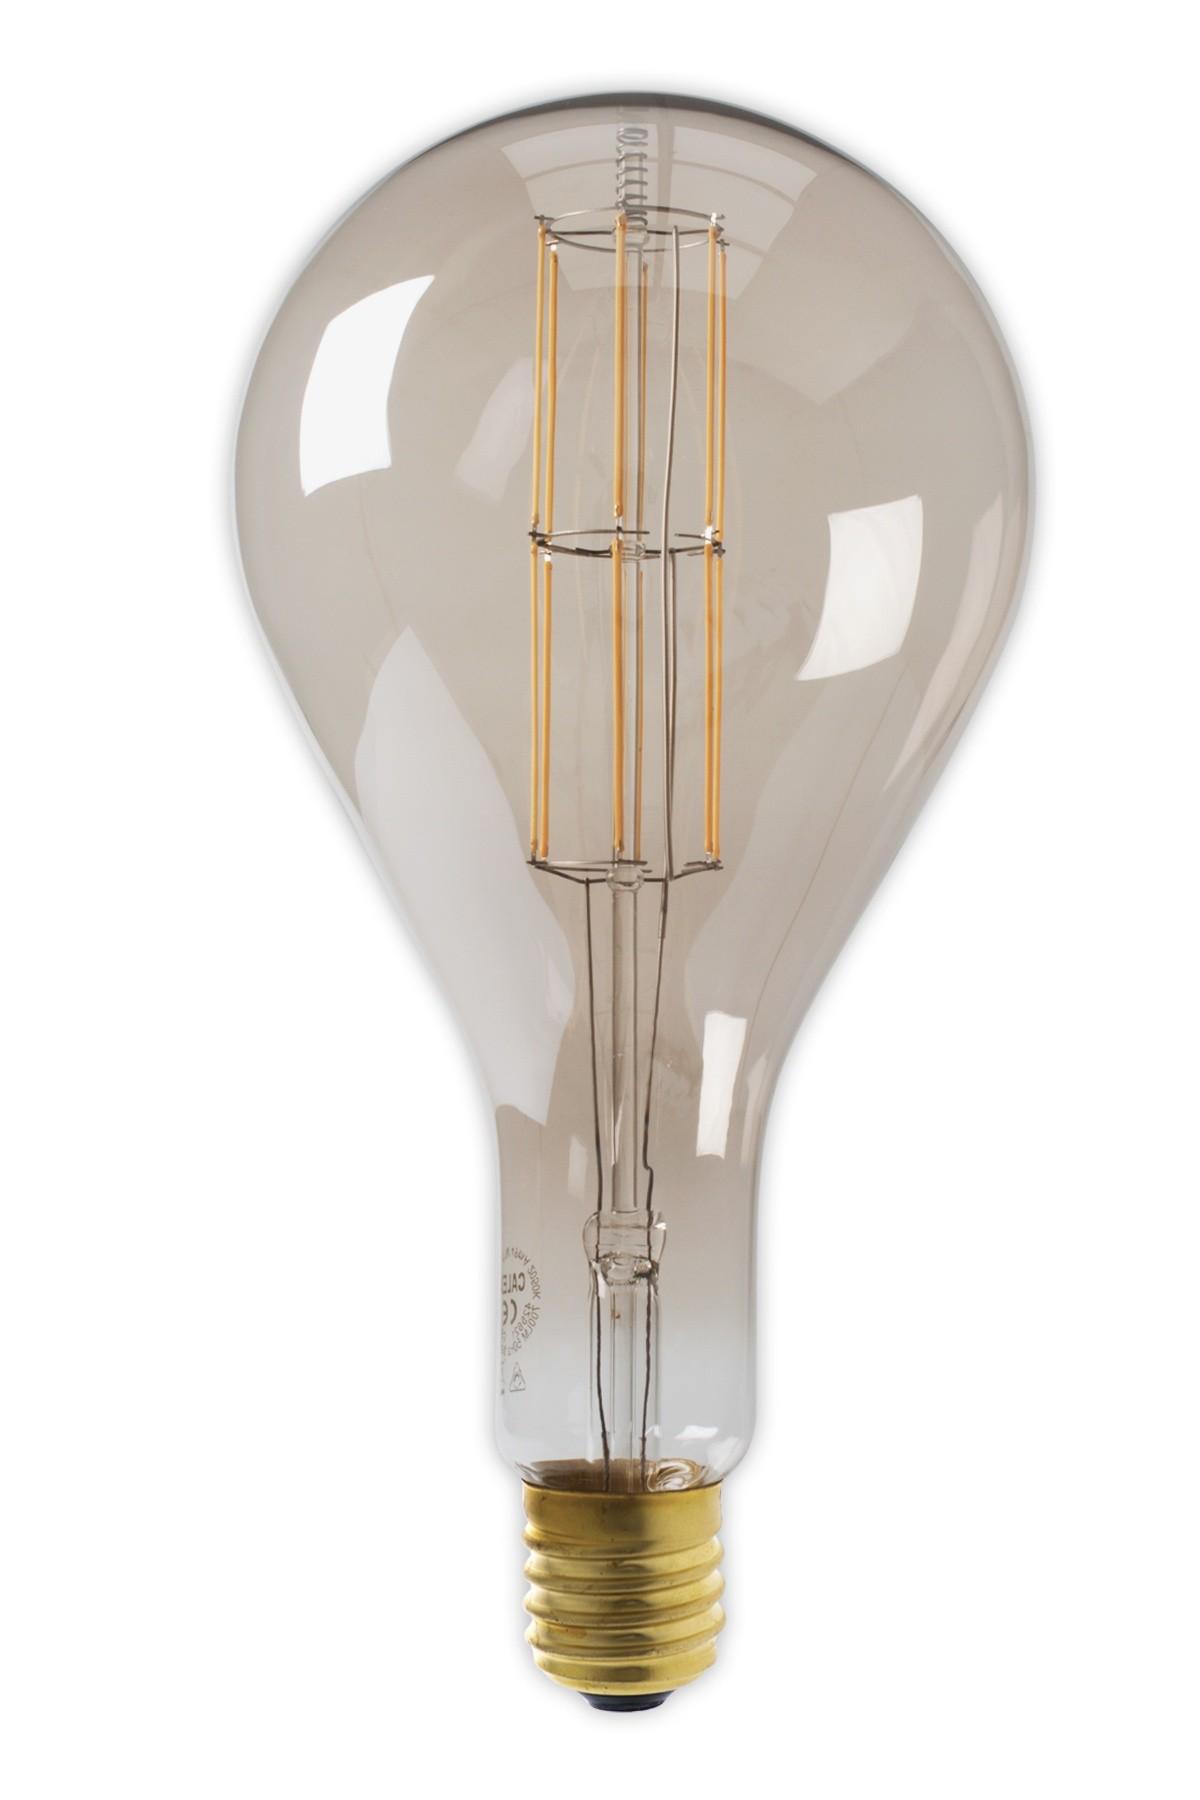 Giant led xxl mega grote mondgeblazen led lampen van calex calex splash giant xxl titanium filament dimbare led lamp met e40 lampvoet parisarafo Gallery